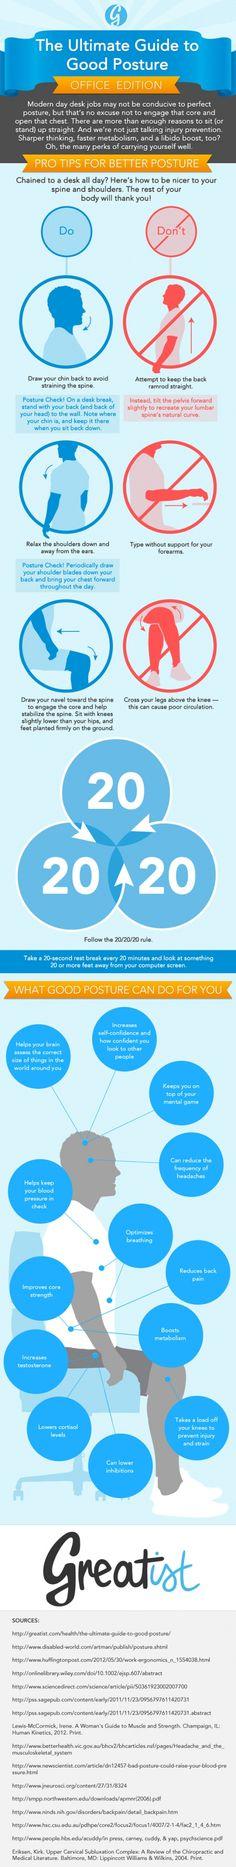 Here are some pro tips to good posture despite having a desk job! #ergonomics #facilities